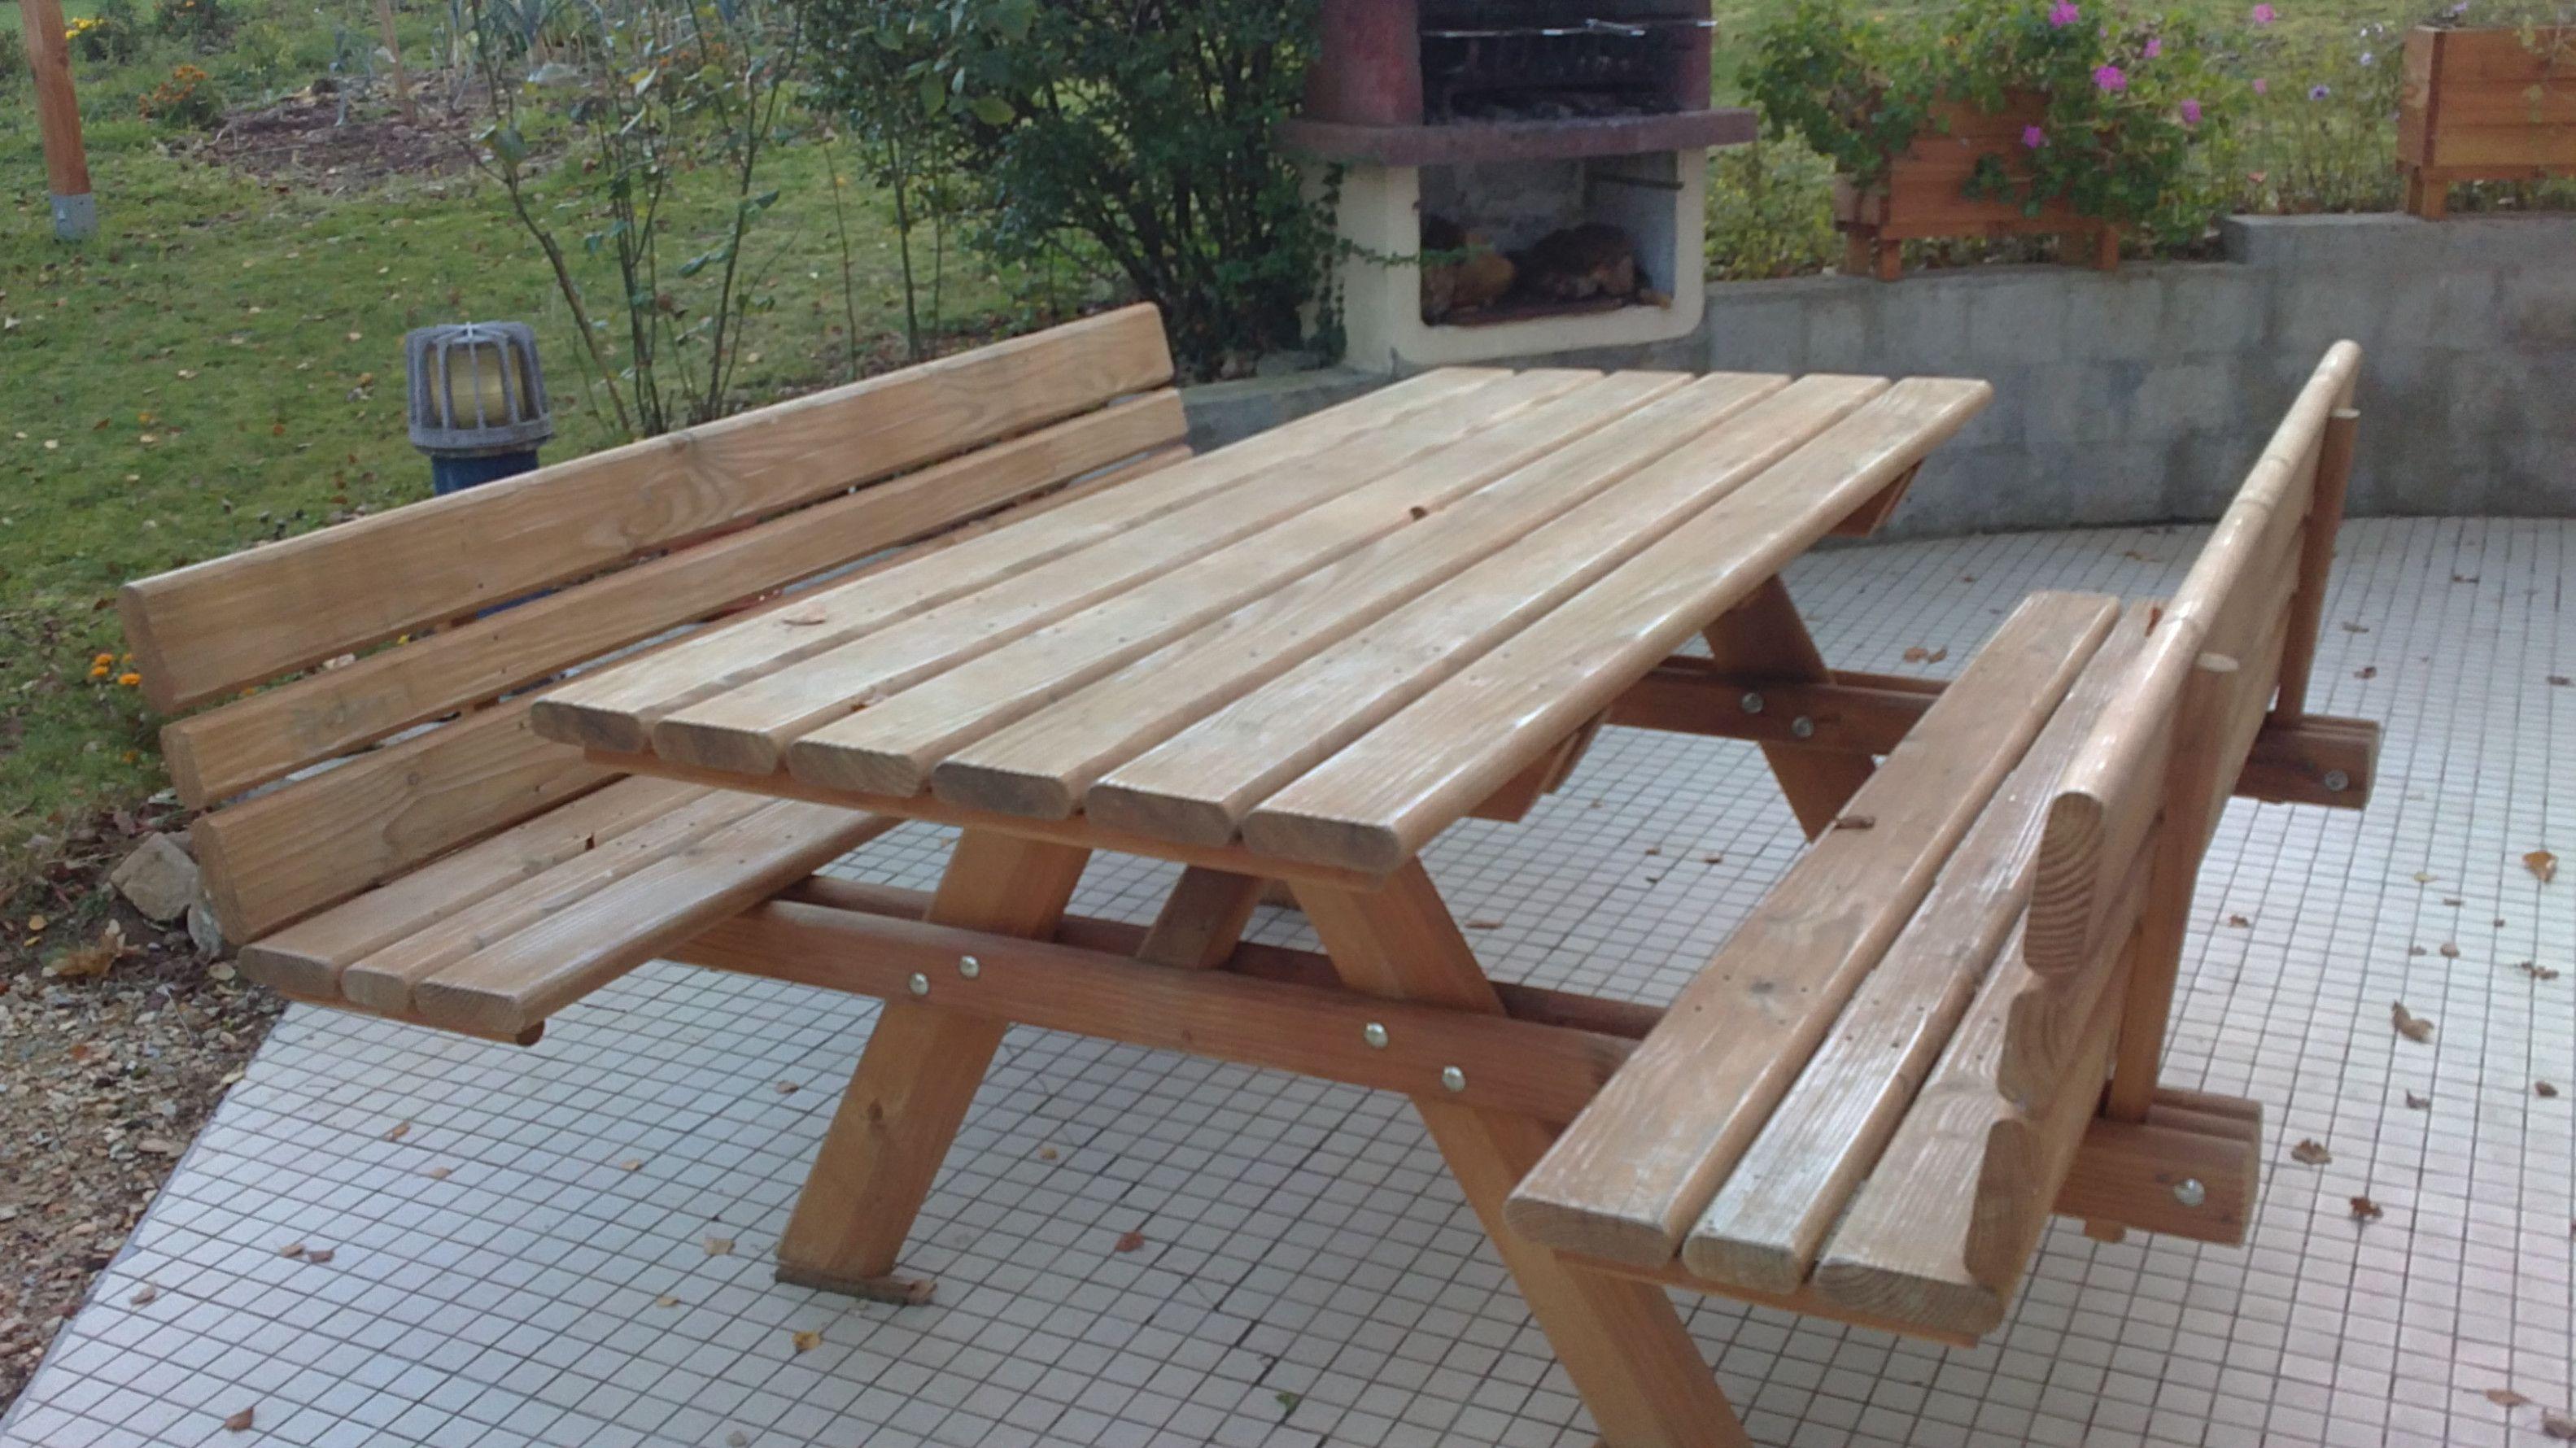 Intermarche Salon De Diy Picnic Table Outdoor Tables Outdoor Decor